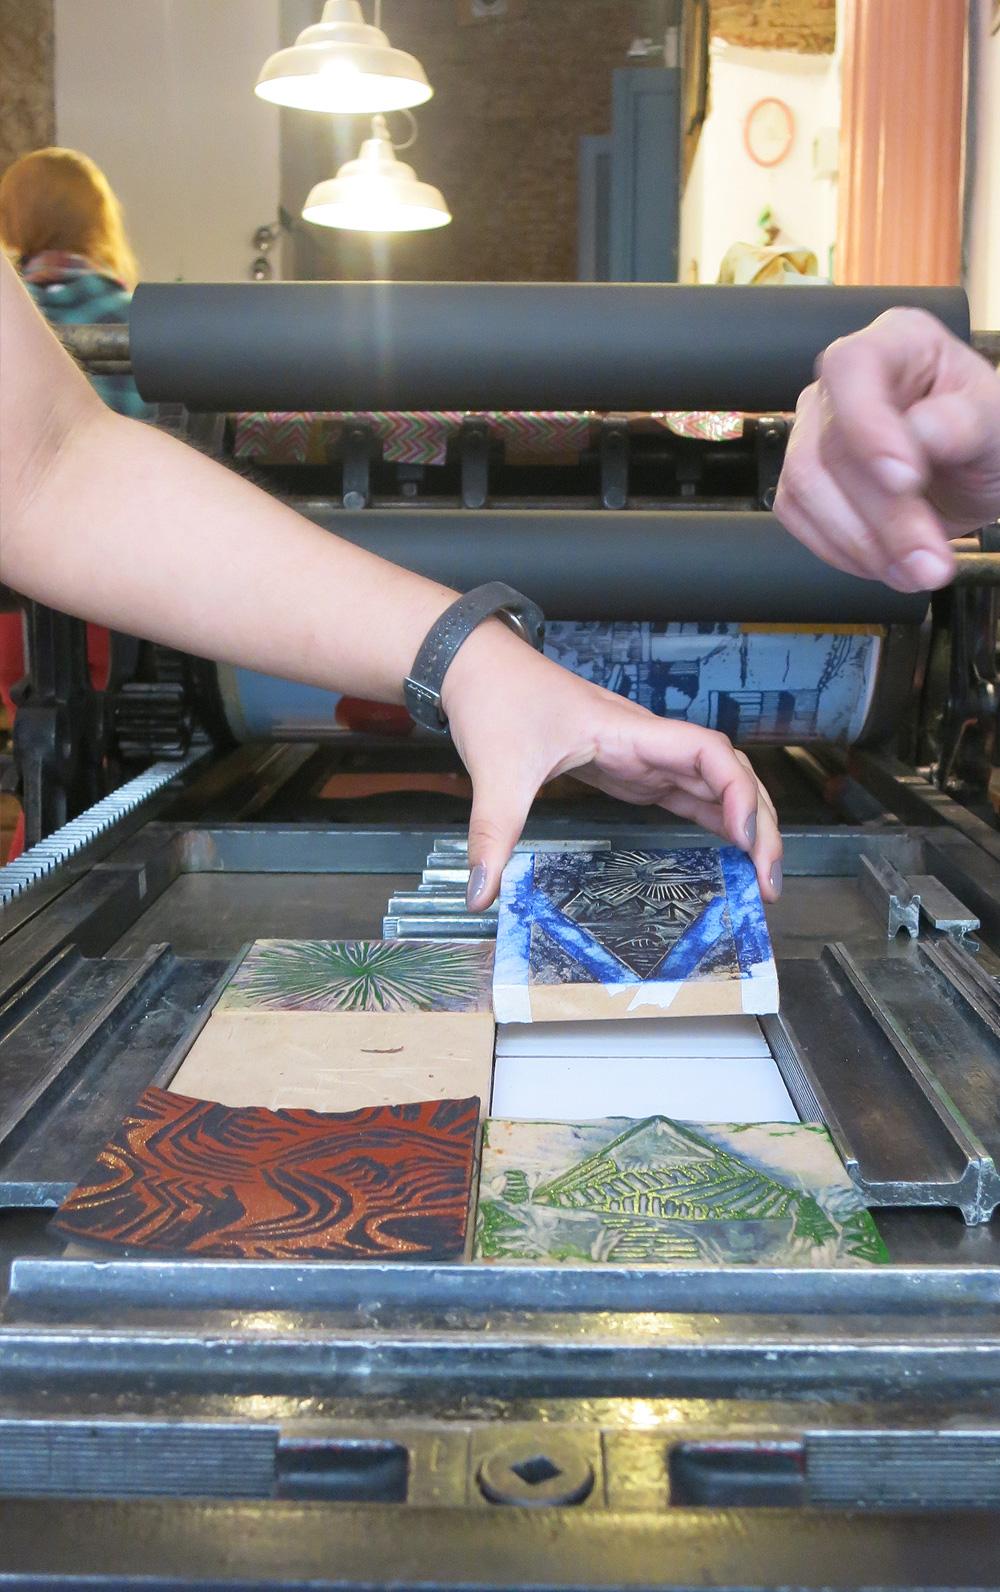 j-xilopress-xilografia-ilustracion-fotopolimeros-grabado-taller-letra-por-letra-papel-principal-letterpress-imprenta-tipografica-1.jpg